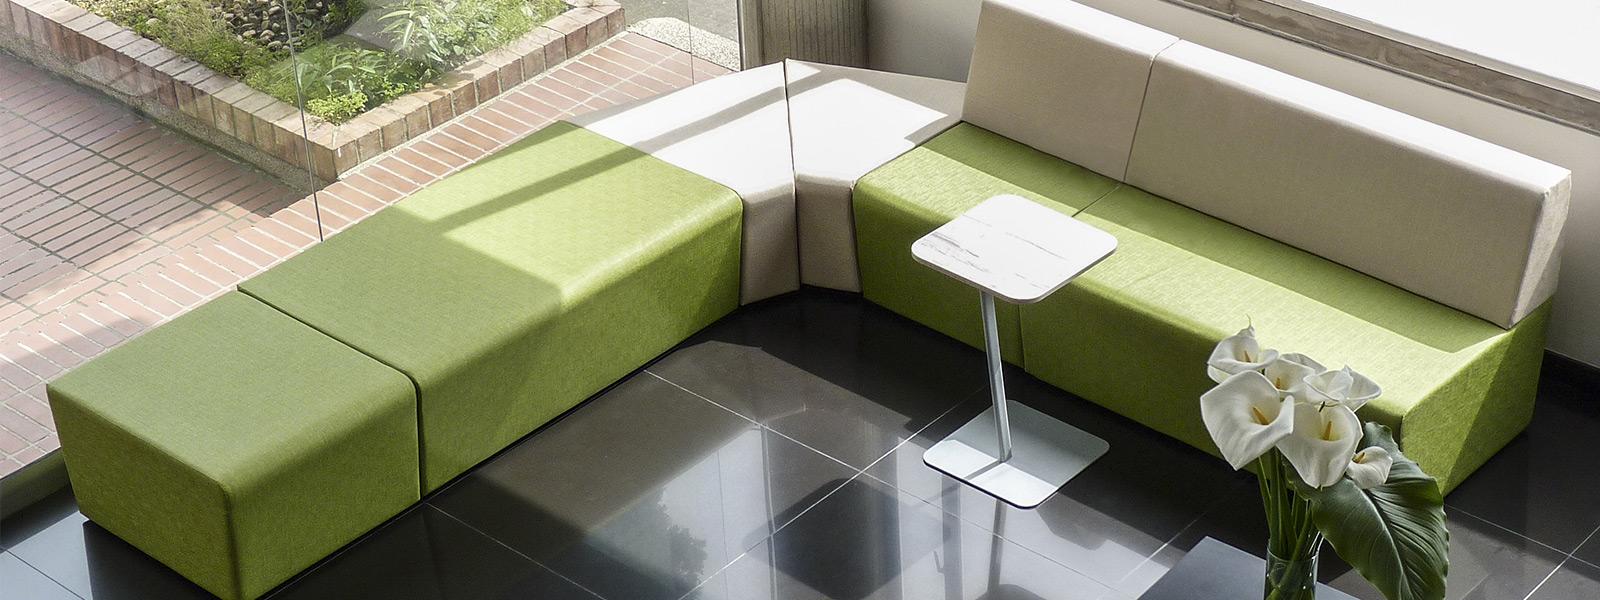 empresas mobiliario corporativo_bogota_integra_oficinas